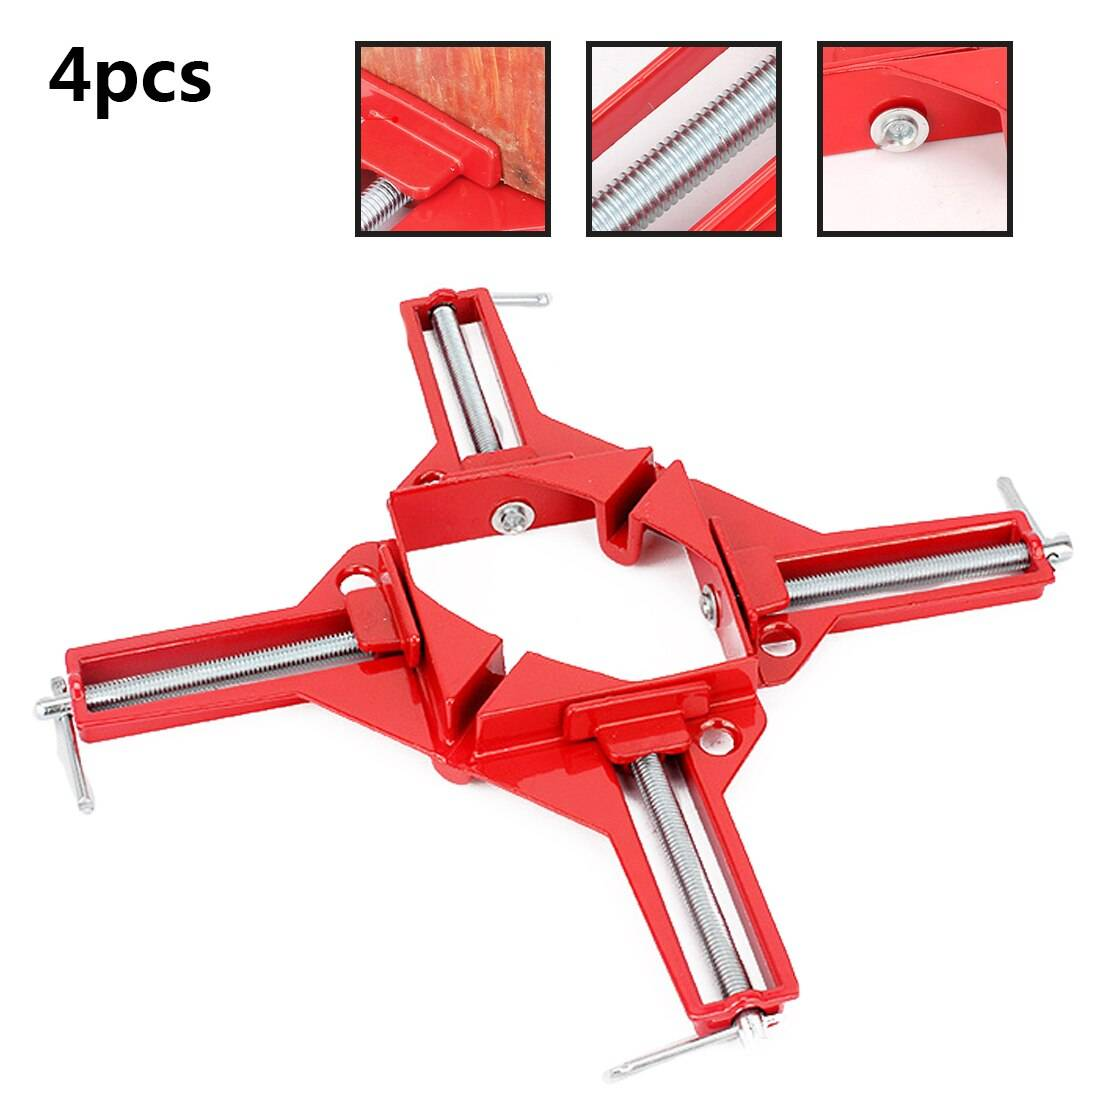 4 inch corner clamp